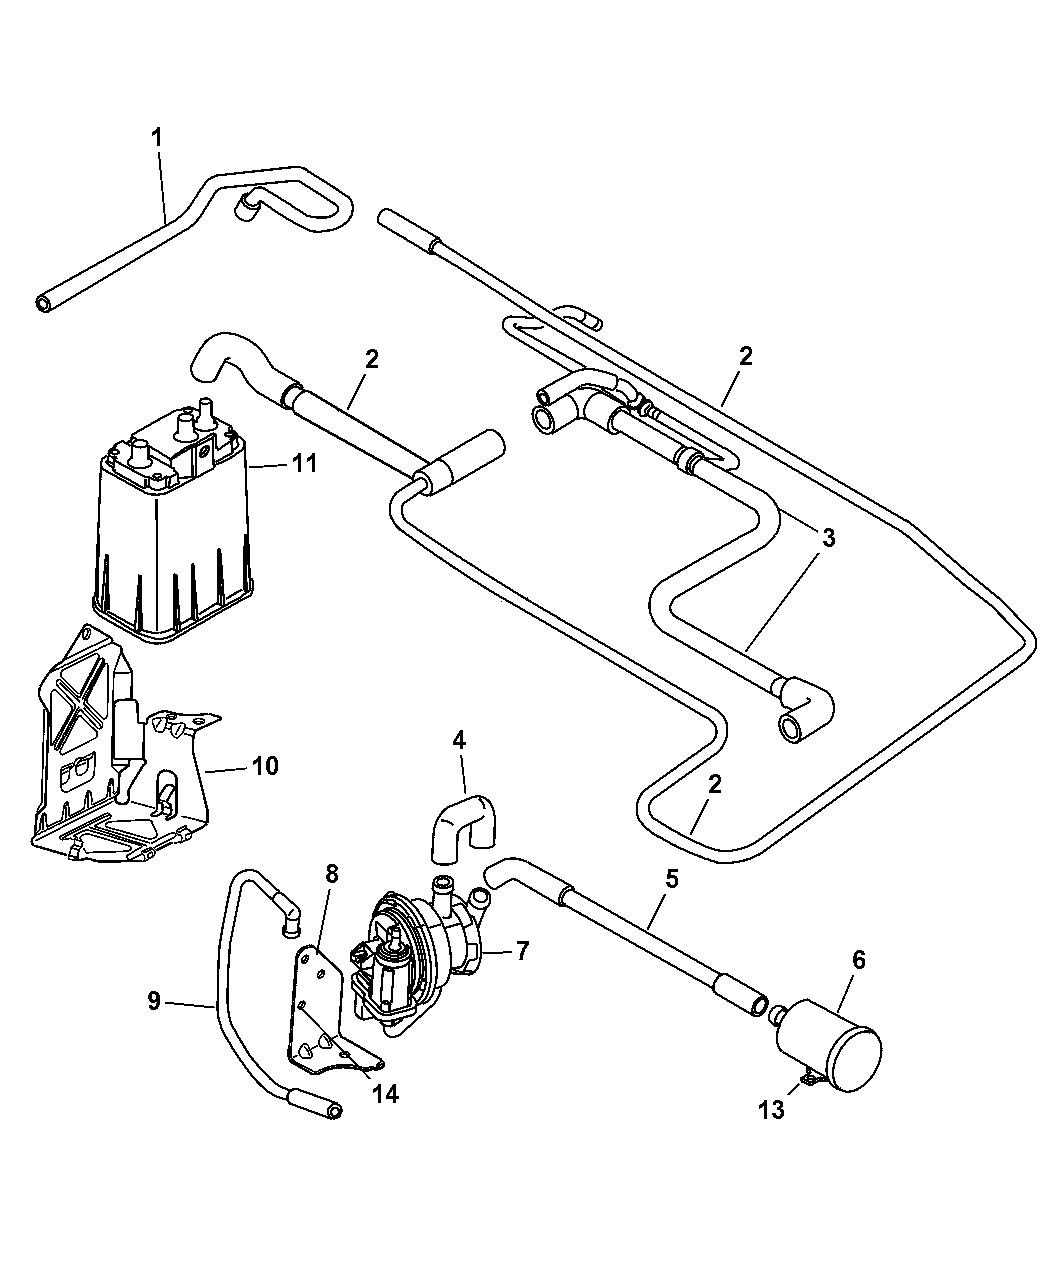 2001 pt cruiser fuel filter